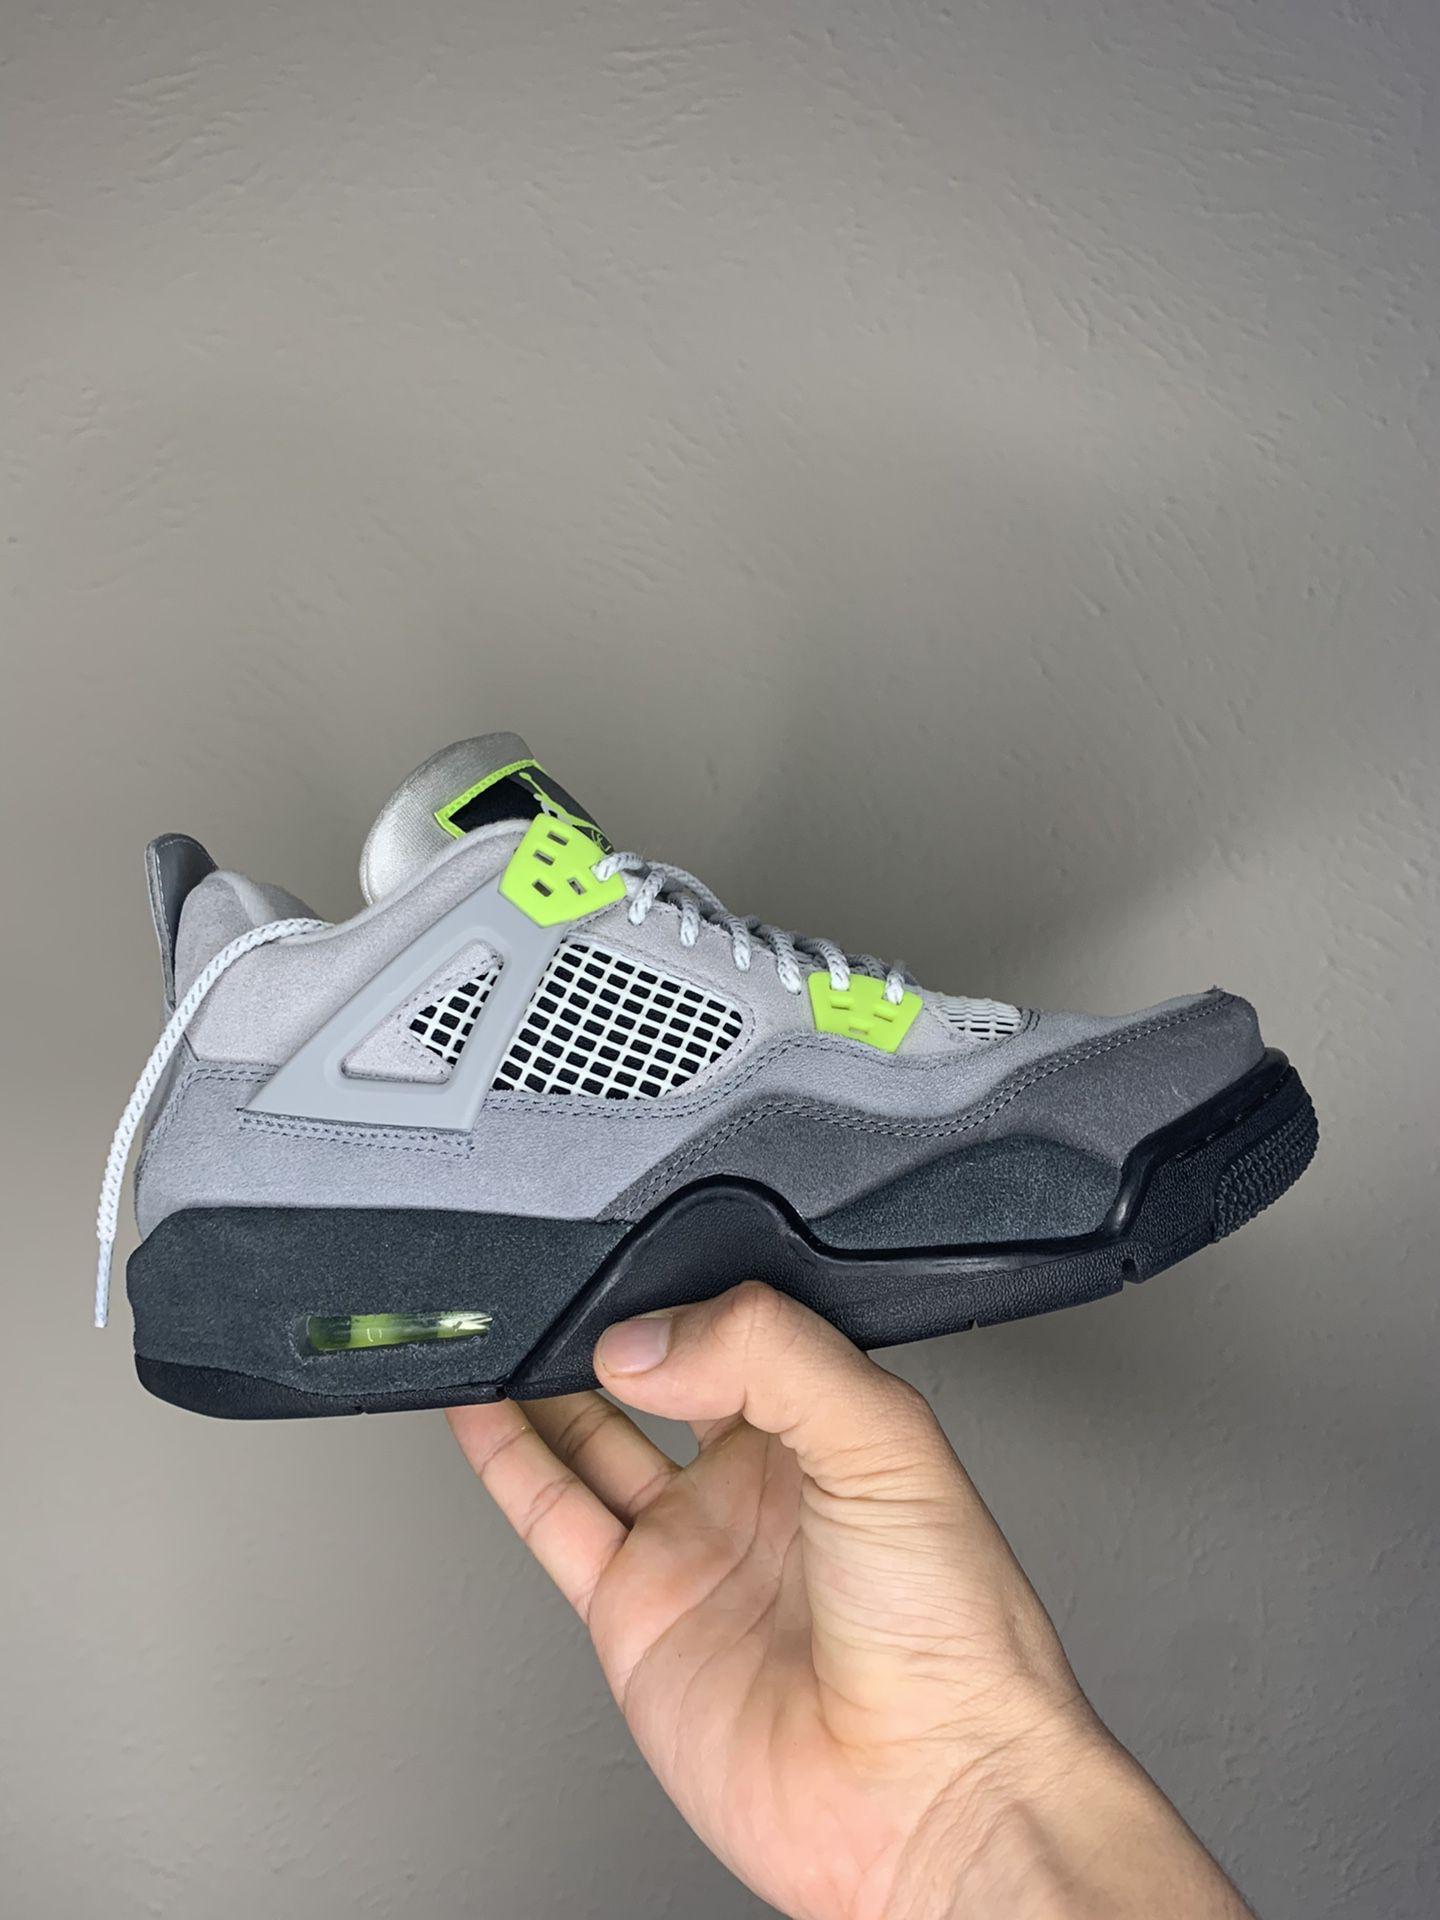 Jordan 4 Neon 95 SE